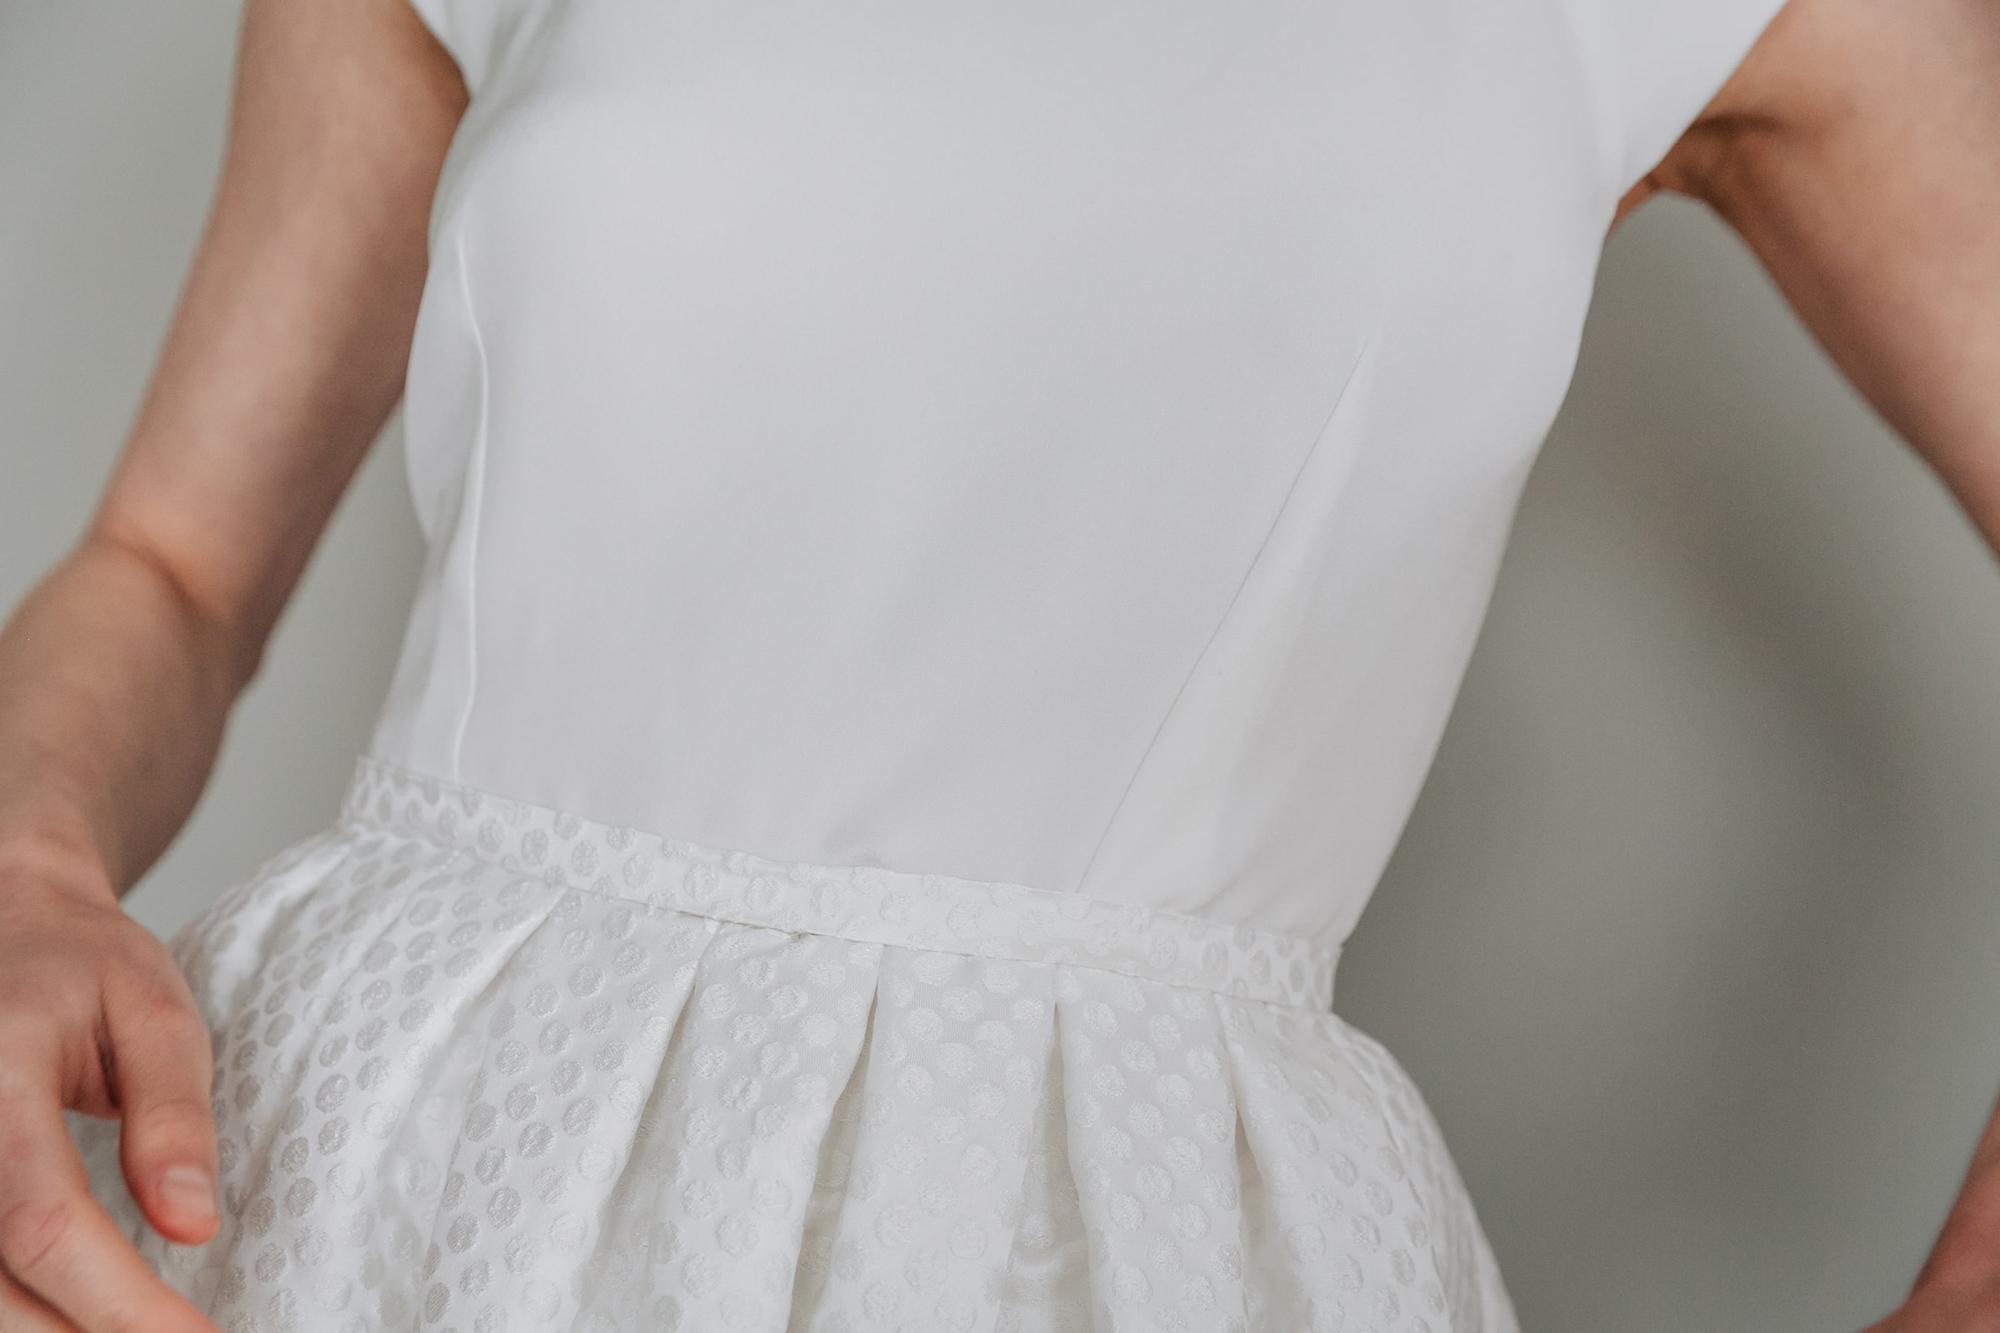 Kate-Beaumont-Sheffield-Zinnia-Modern-Wedding-Gown-Polka-Dot-Pleated-Skirt-3.jpg